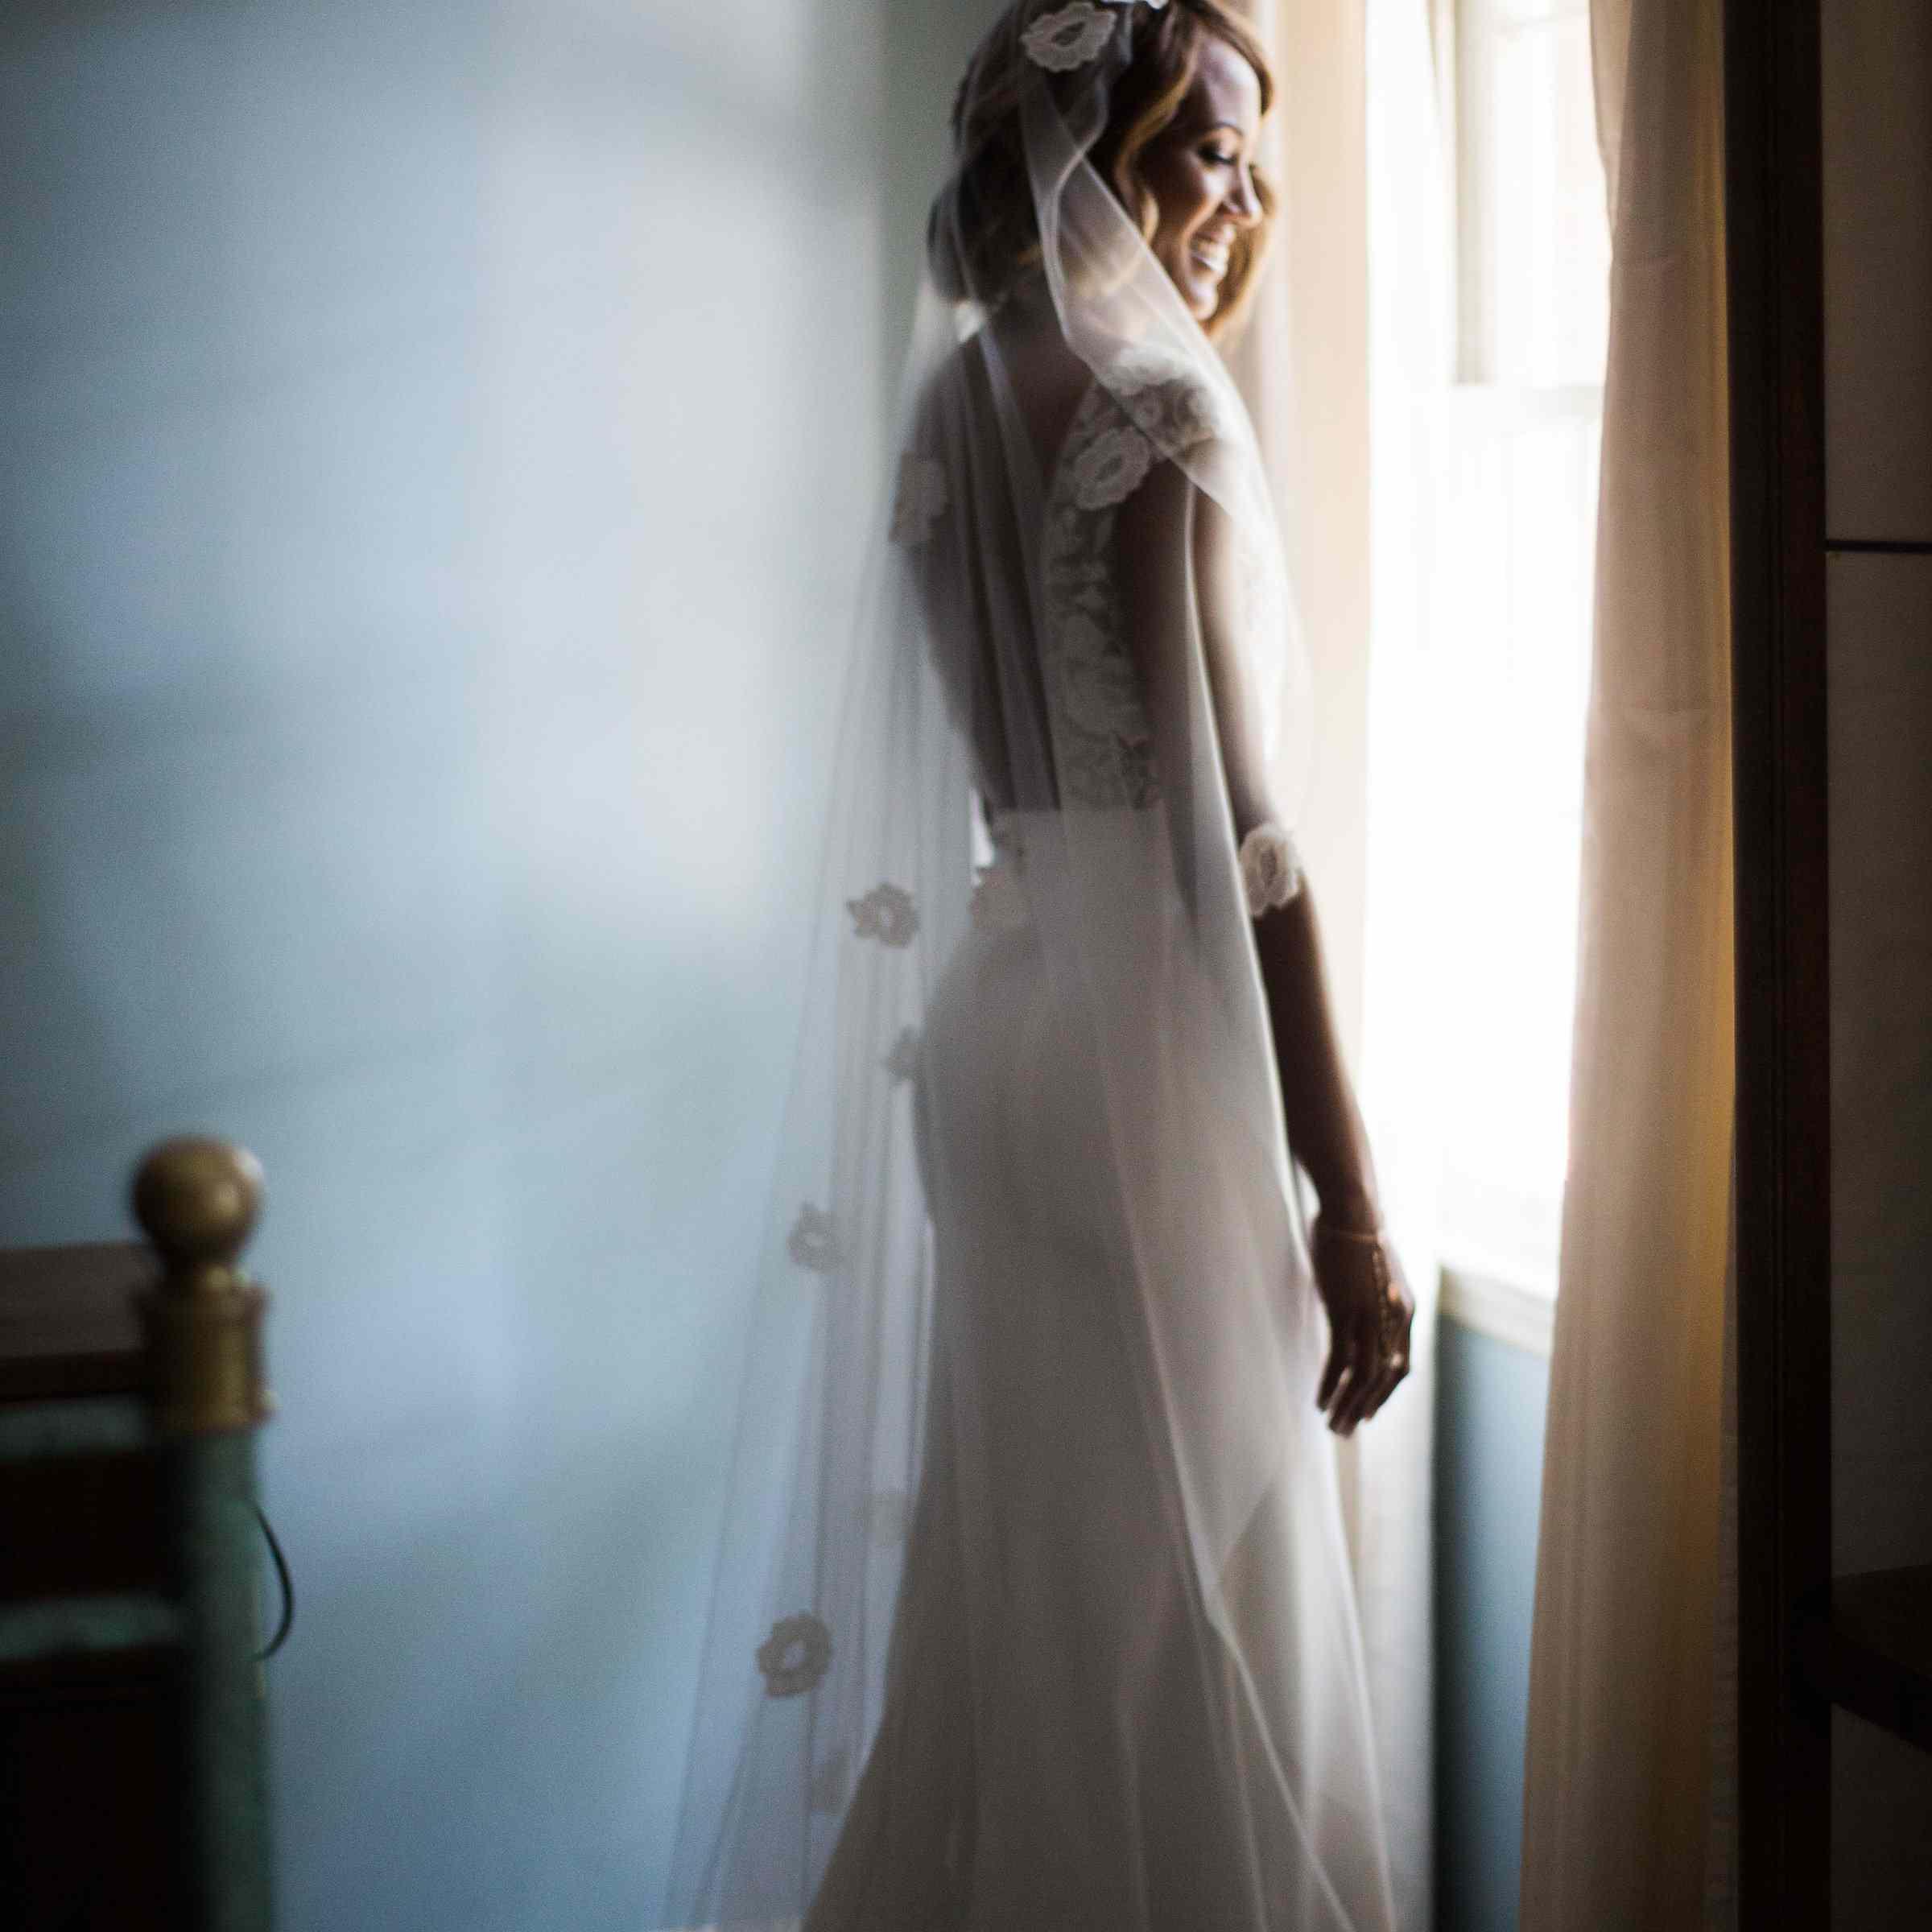 Bride in window with veil